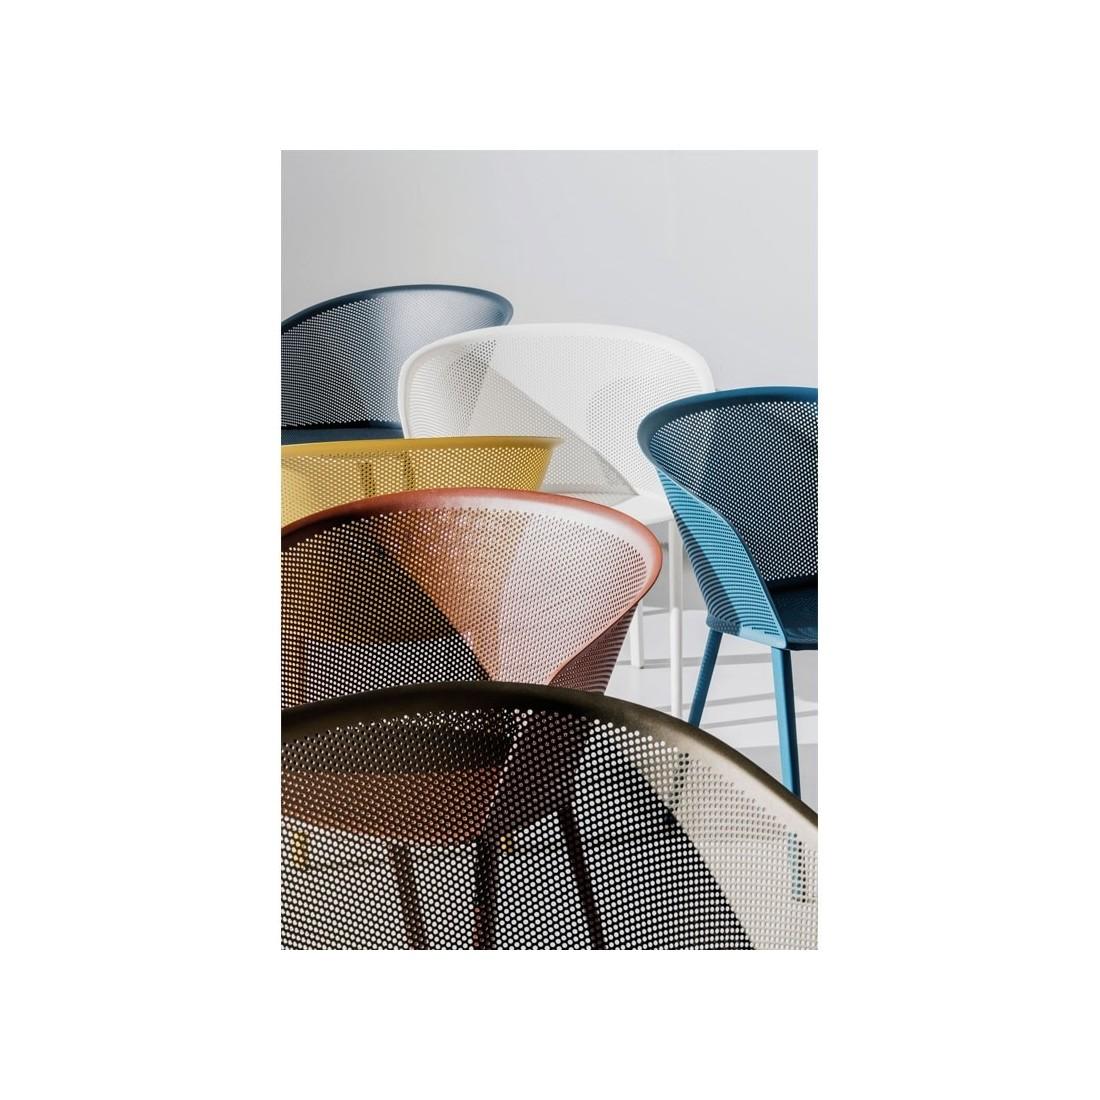 Chaise de jardin avec accoudoirs STAMPA - KETTAL Kettal Confort Jardin